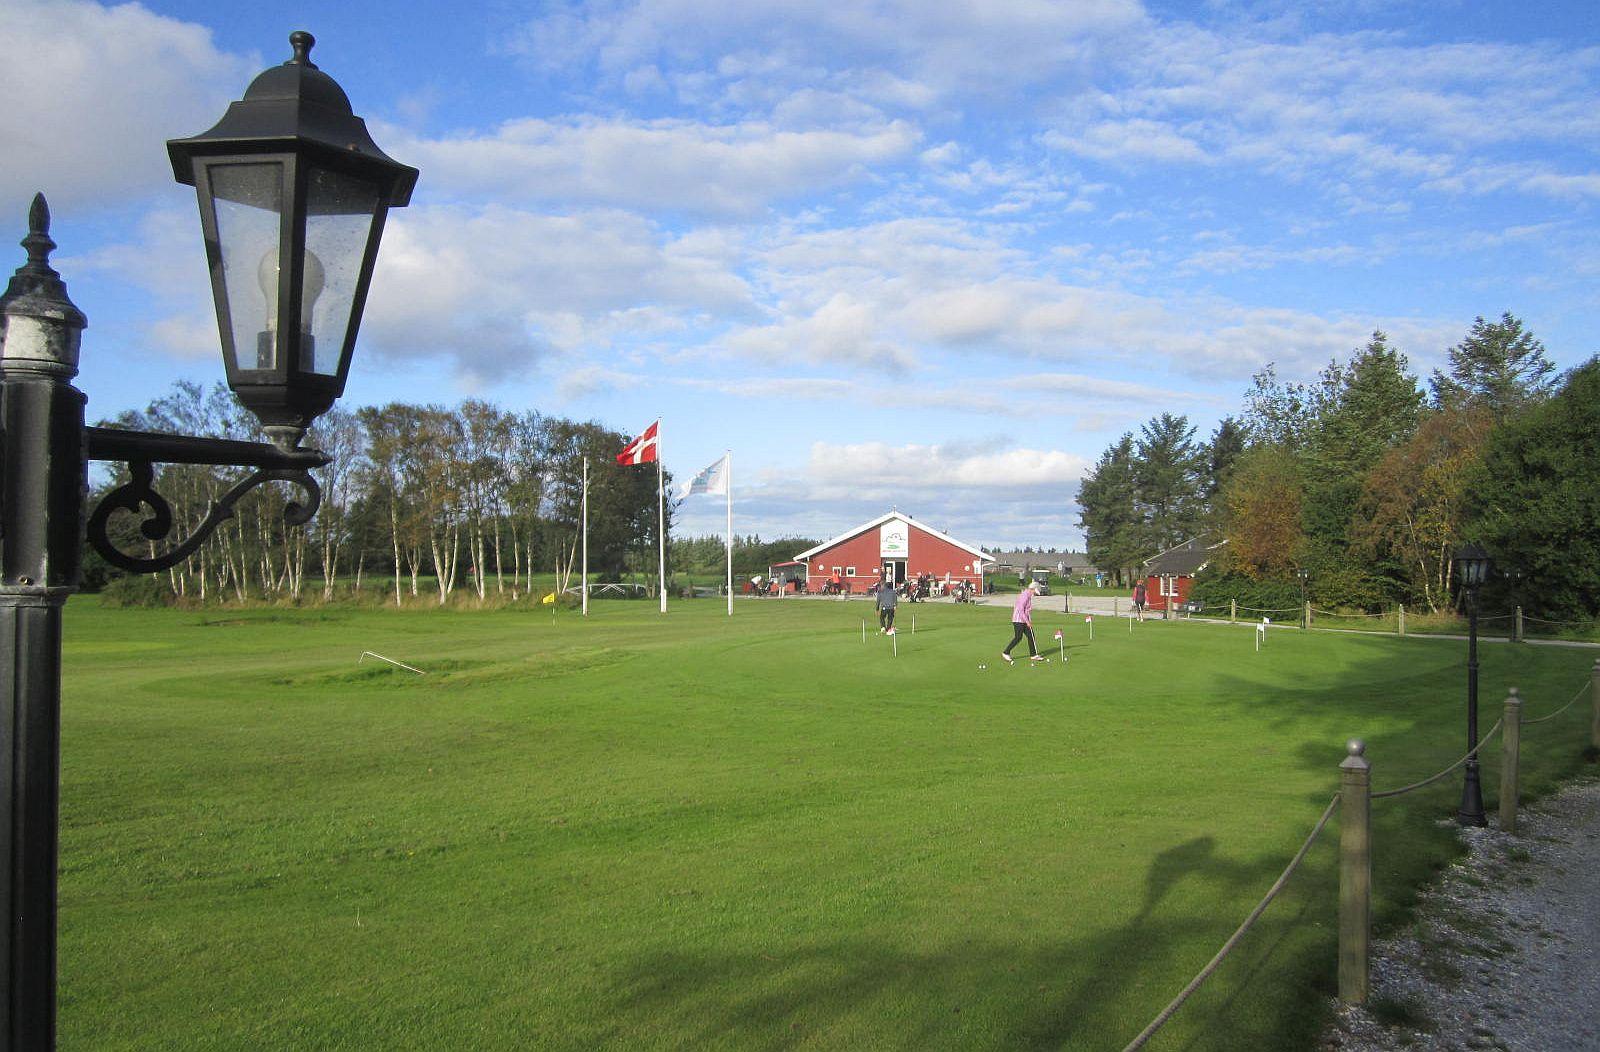 Overview of golf course named Loekken Golf Club